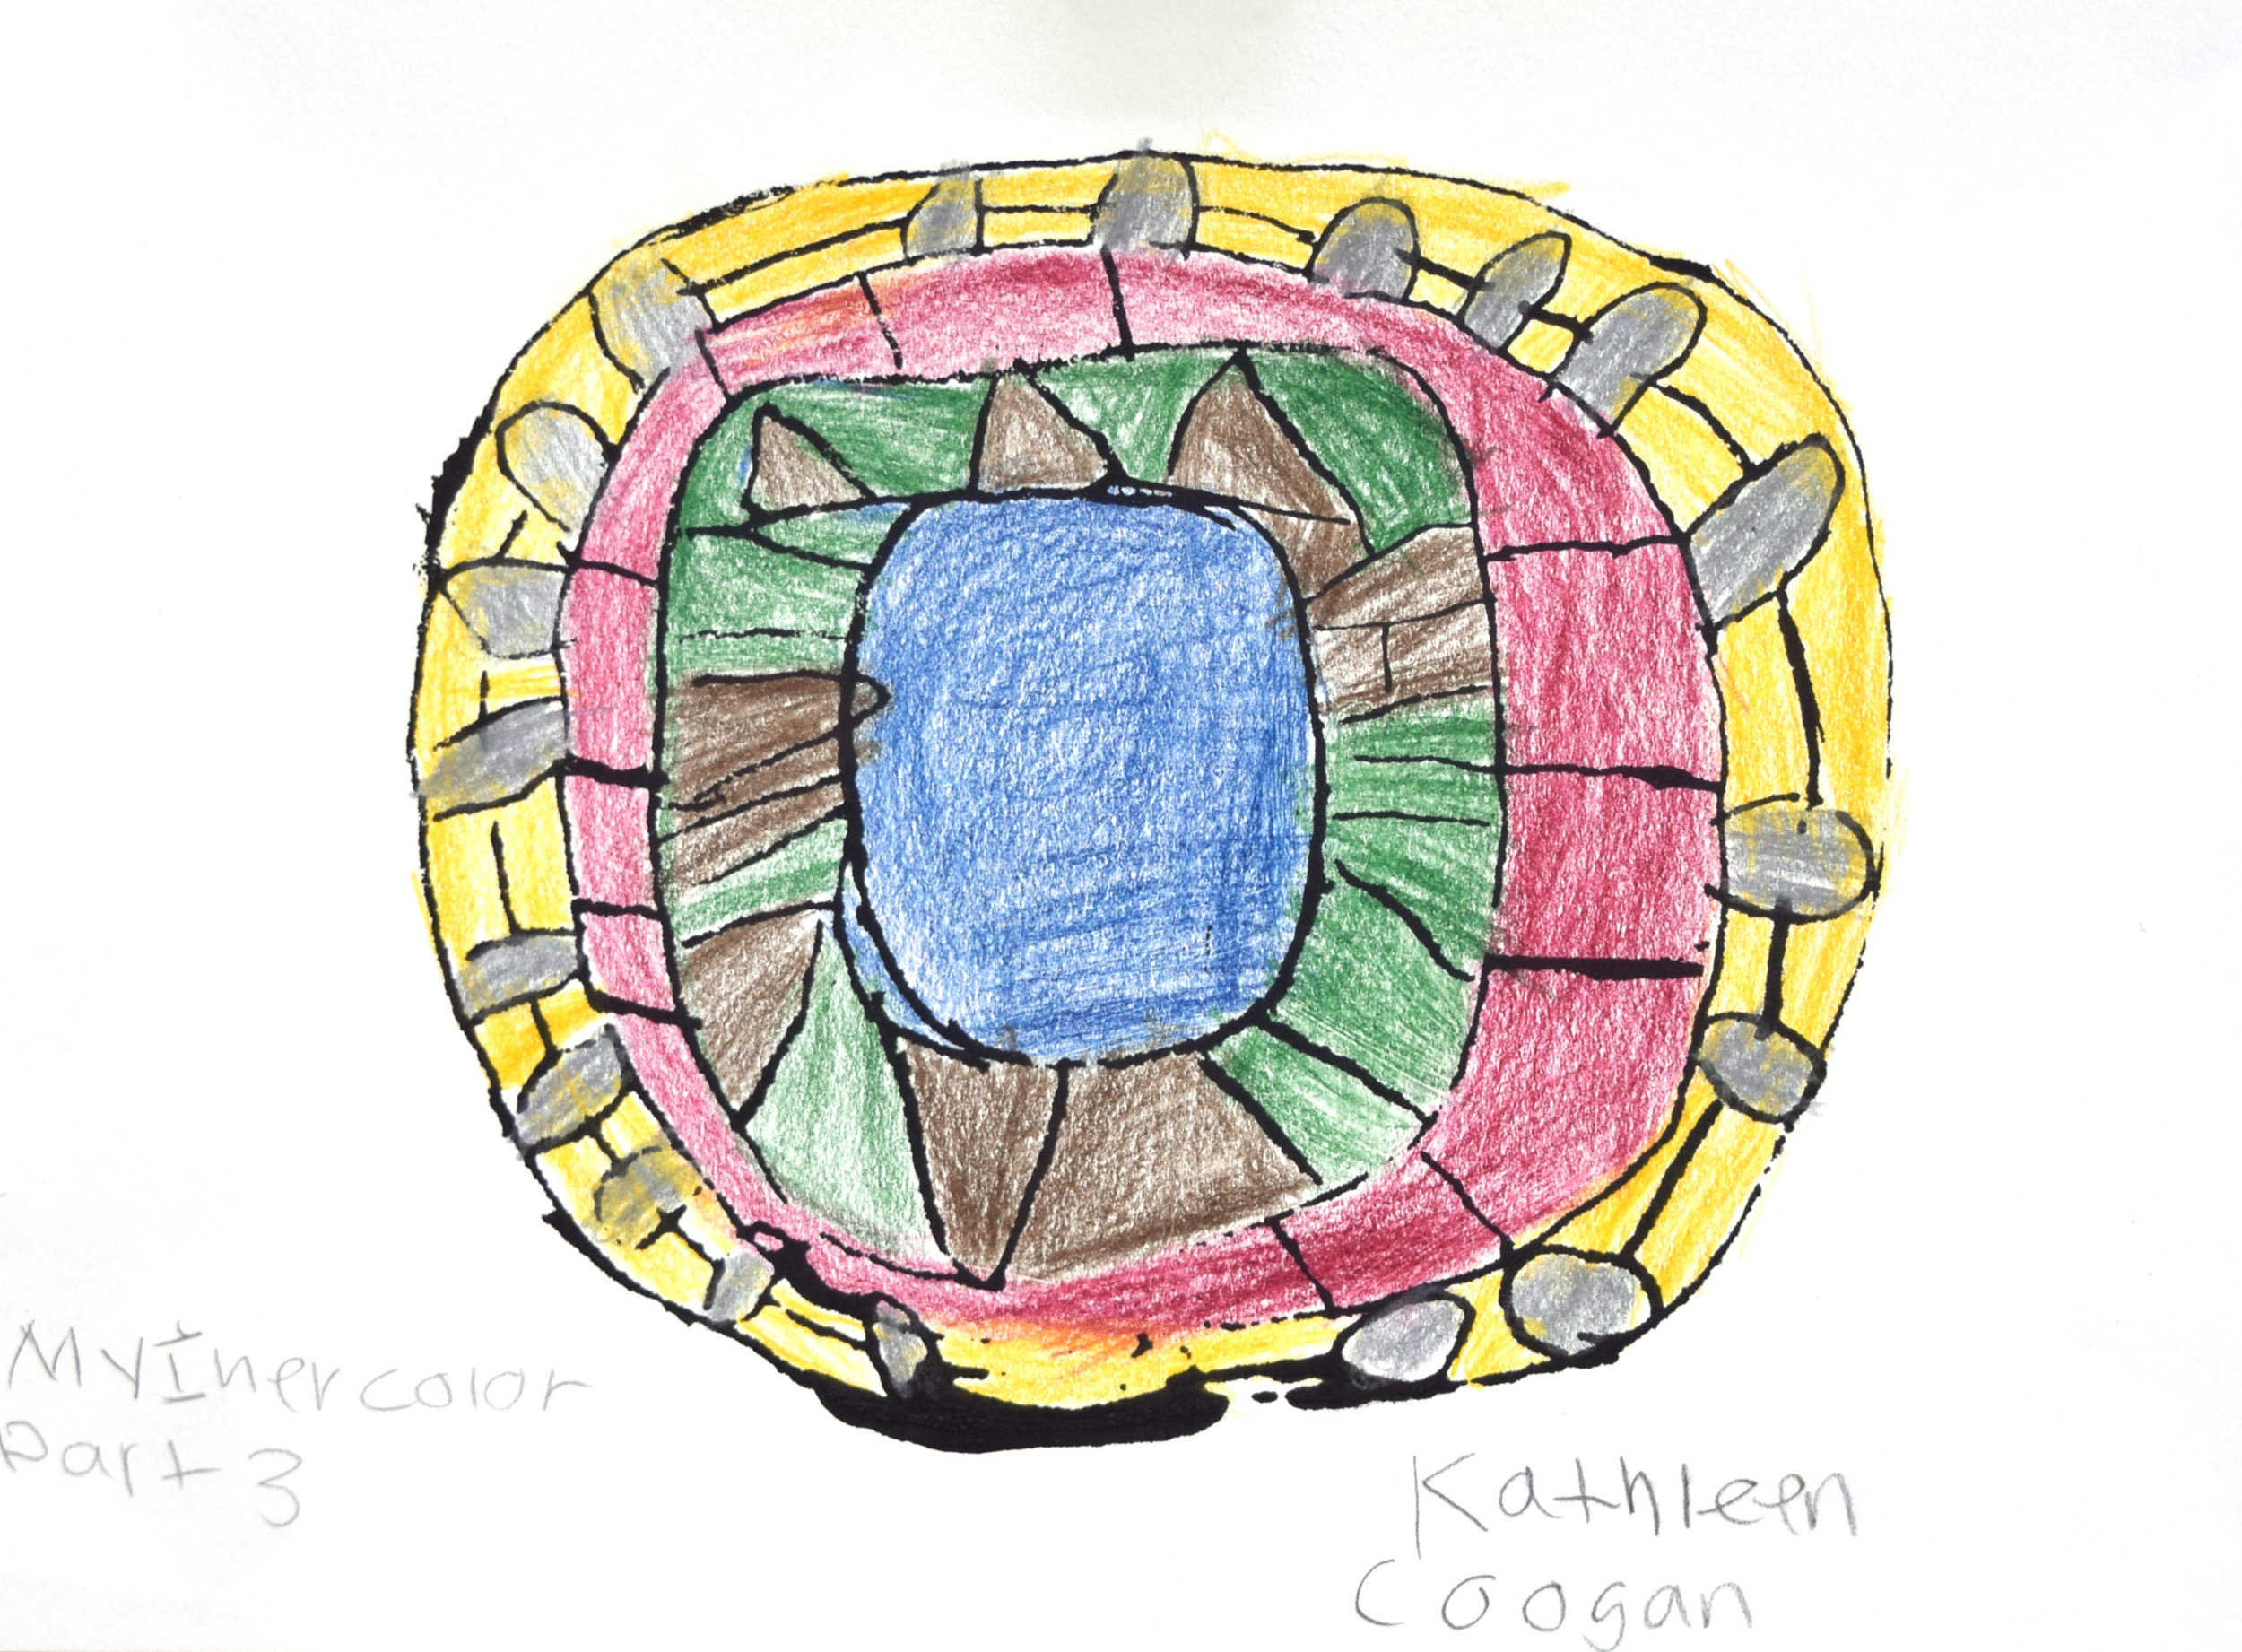 Kathleen Coogan